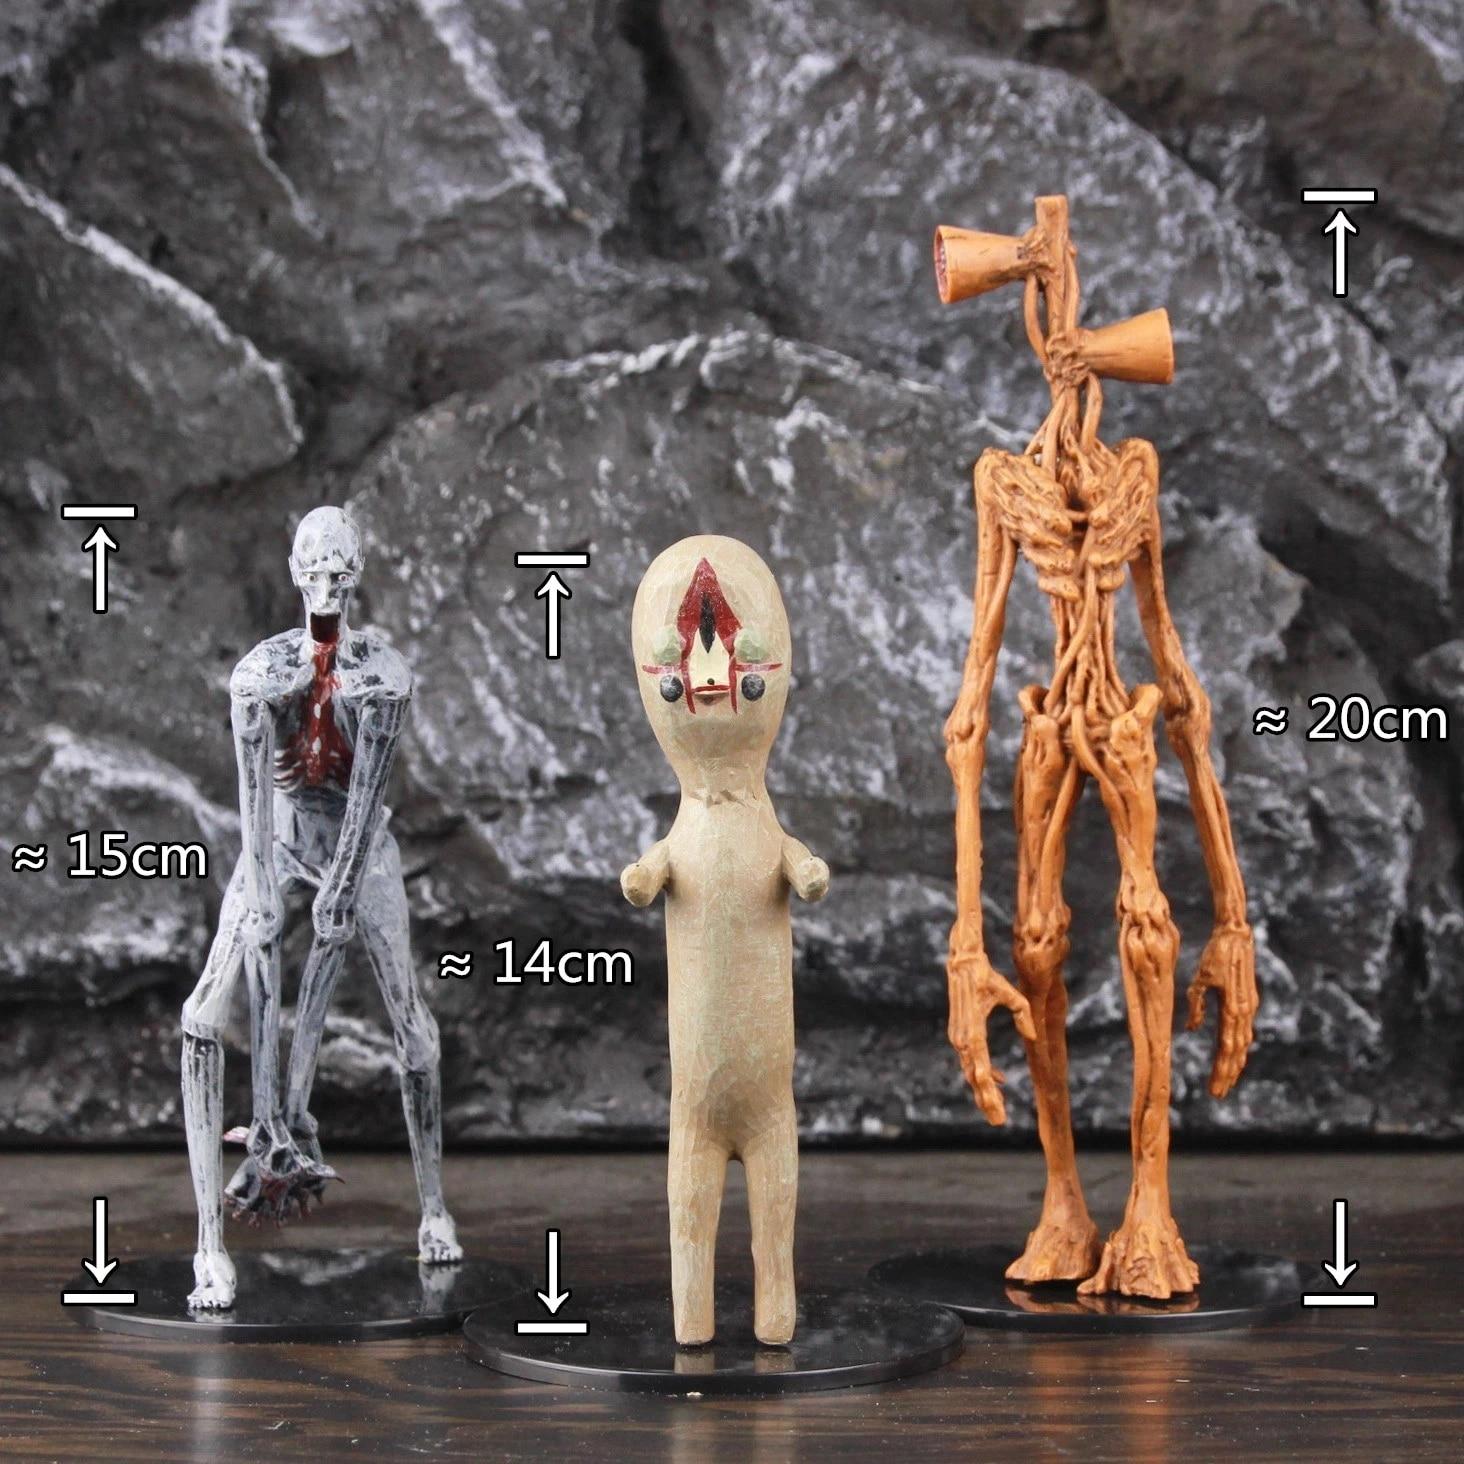 Anime Scp 6789 173 096 Siren Head The Original Sculpture Shy Guy Figurine Horror Urban Legend Foundation Action Figure Doll Toys Action Figures Aliexpress